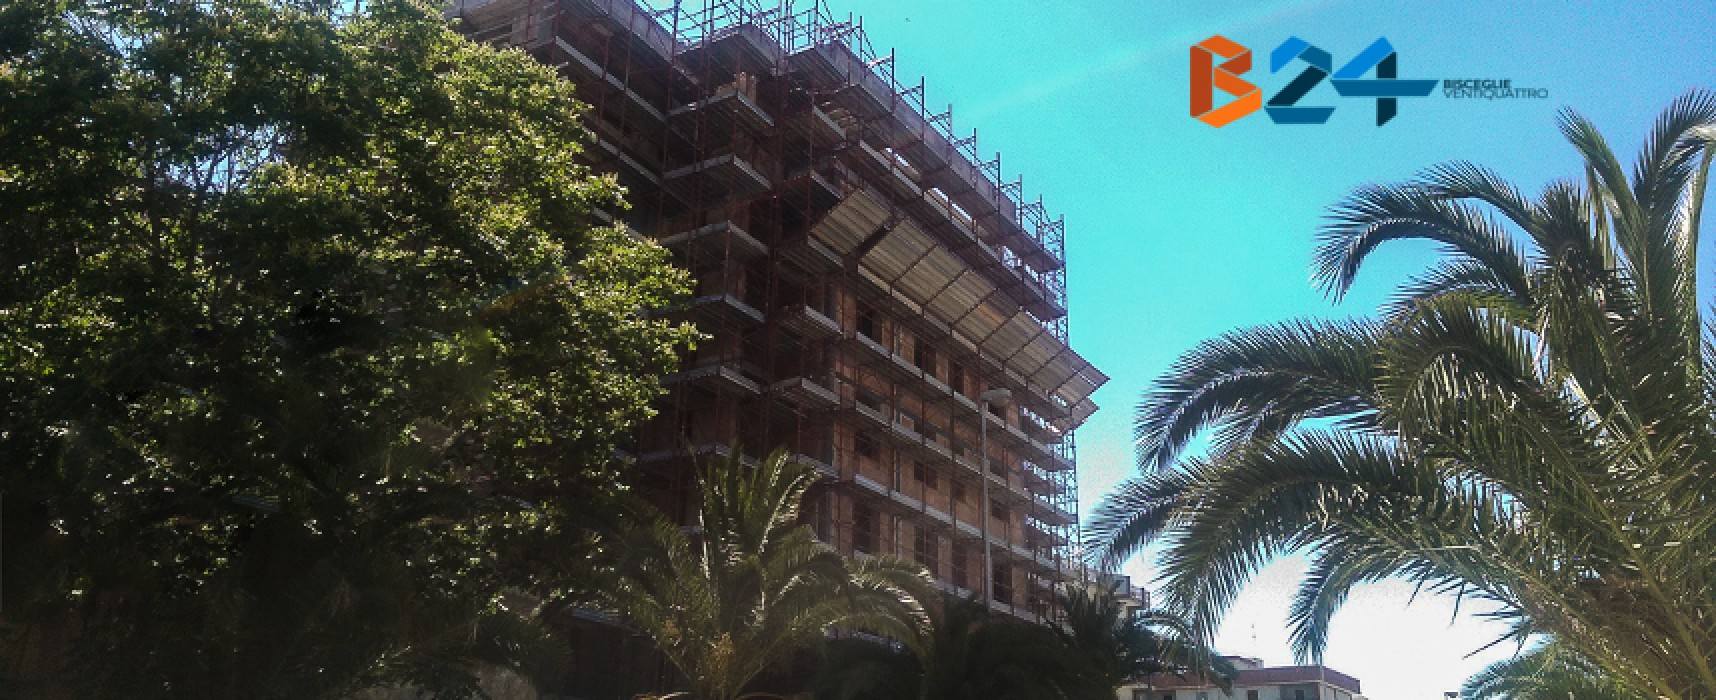 Sequestri a imprenditore coratino: tra i beni anche appartamenti in costruzione a Bisceglie